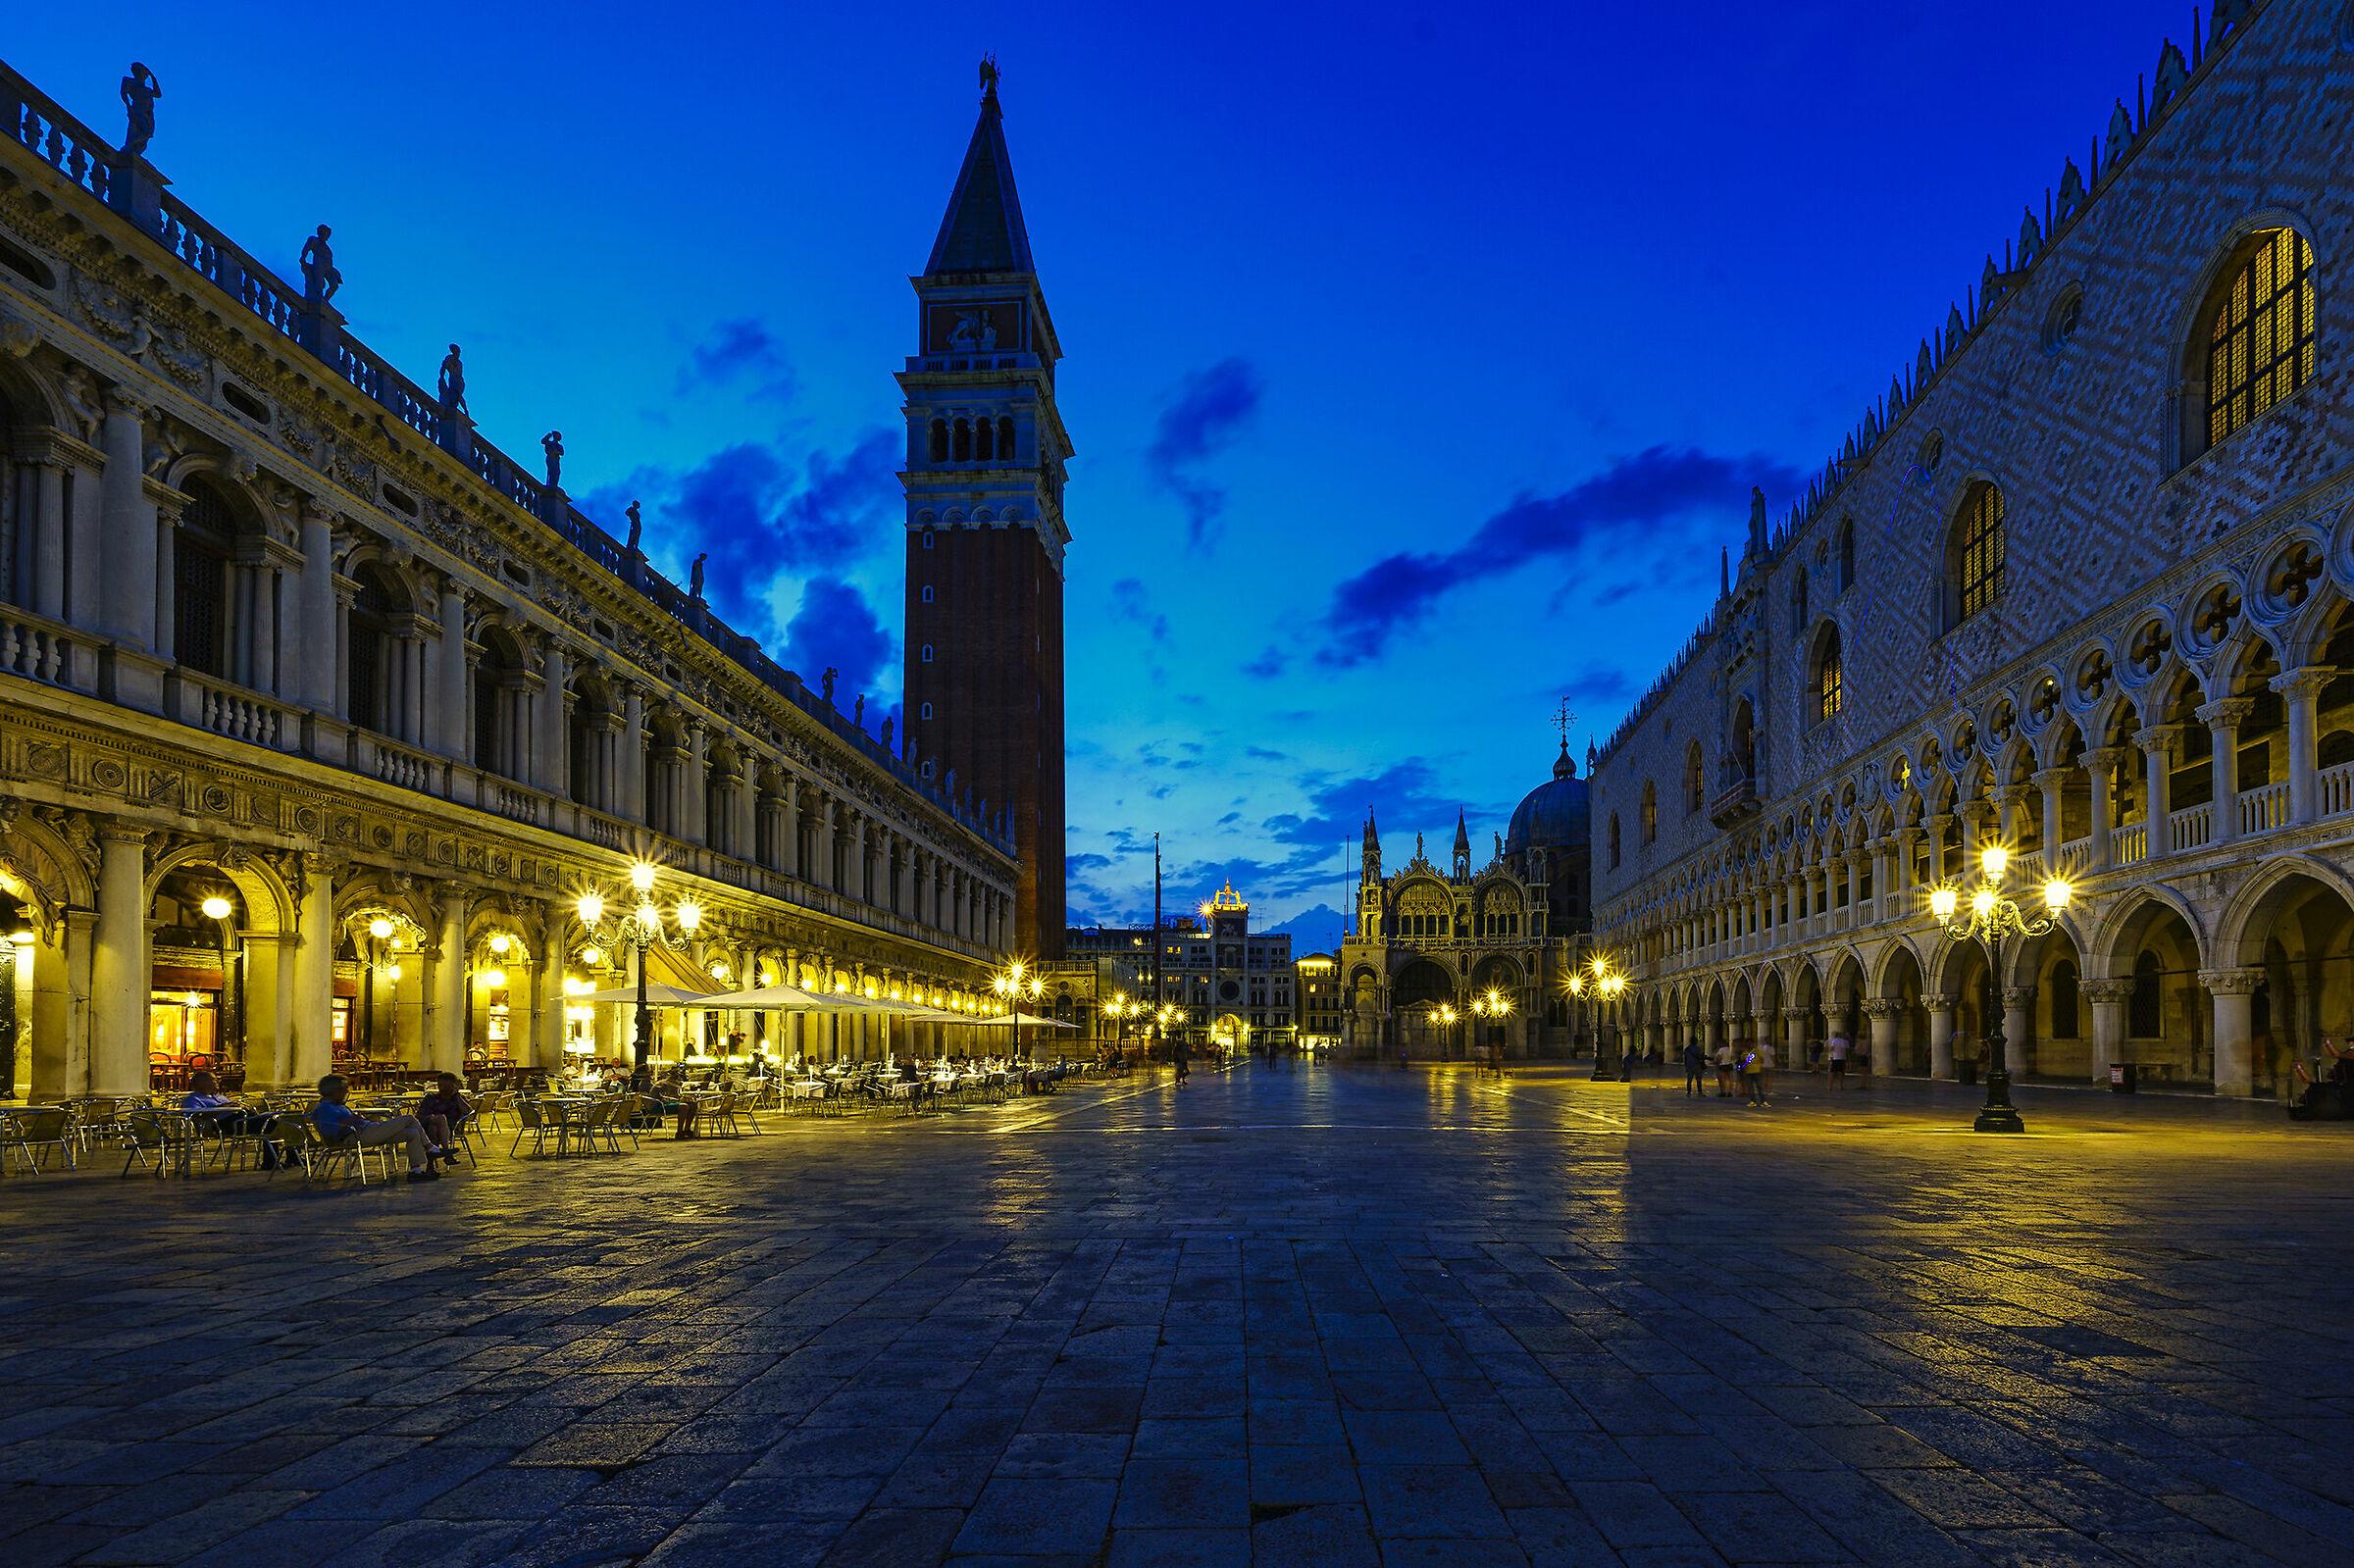 Venice St. Mark's Square, now blue...